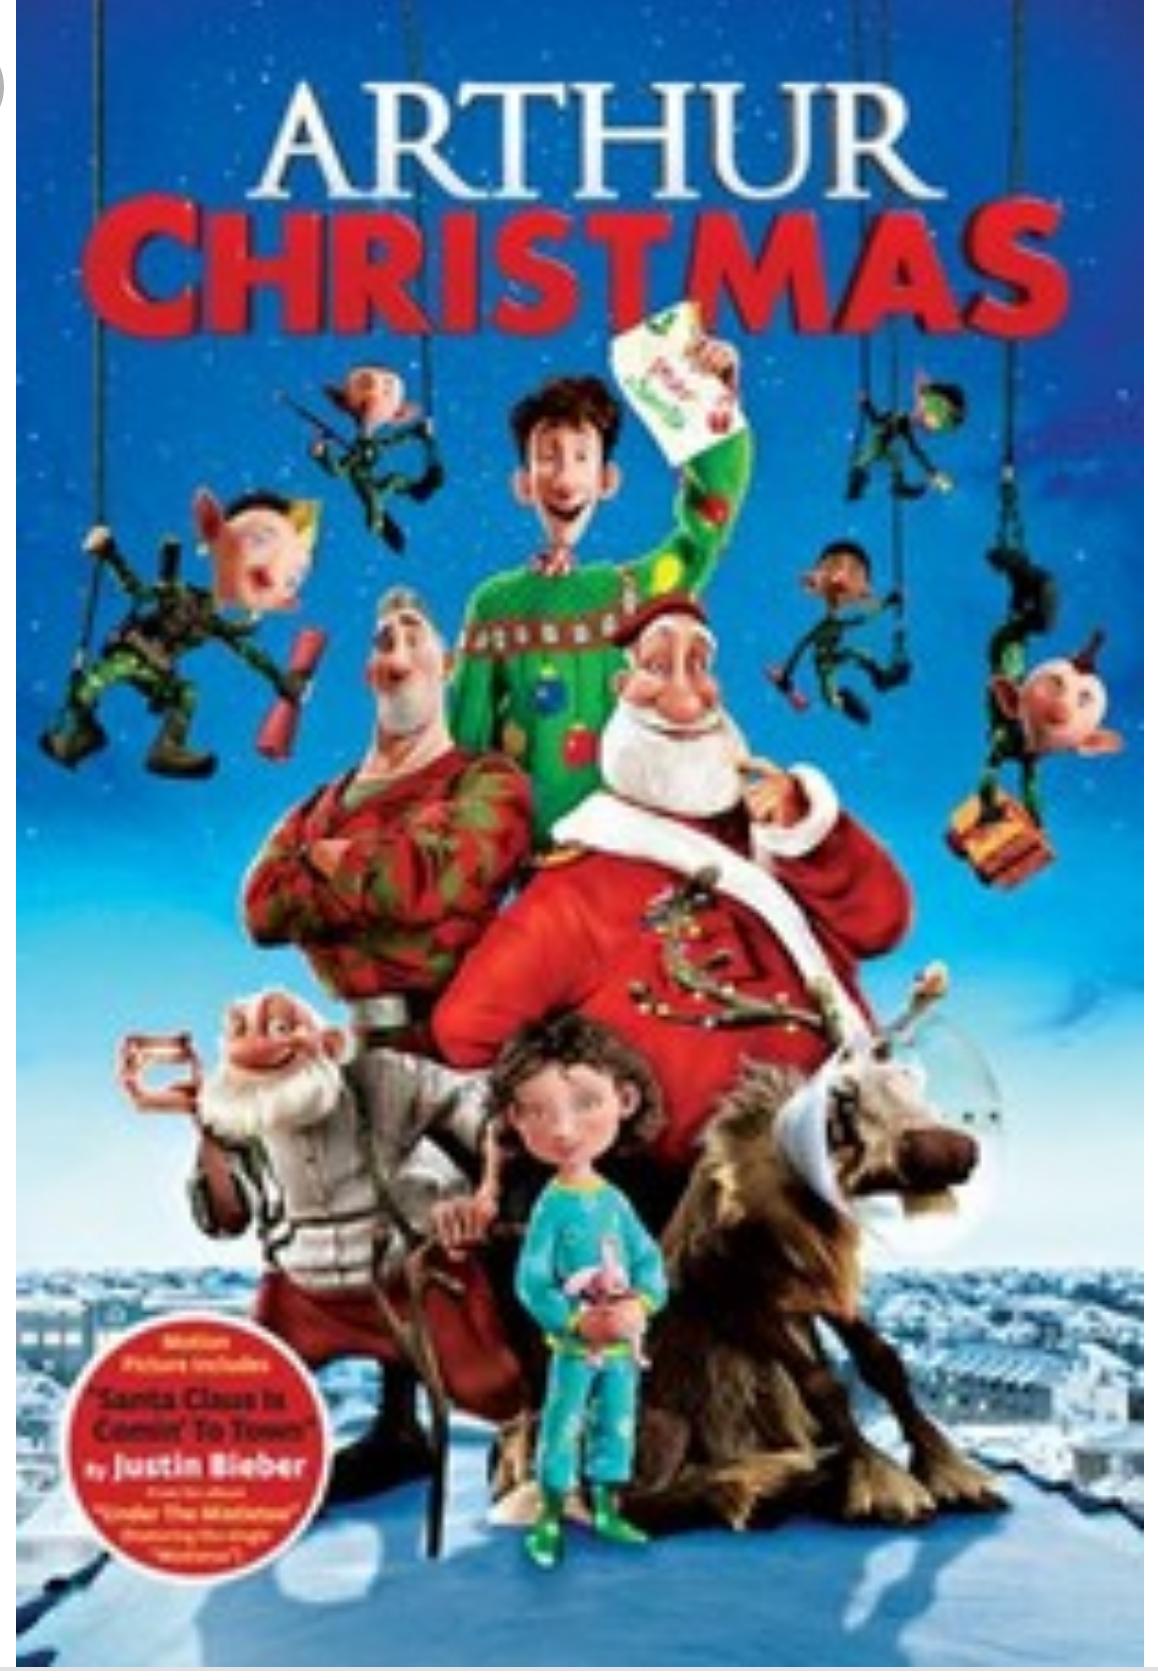 Arthur Christmas now on Netflix! @ Netflix (From £5.99 per month)